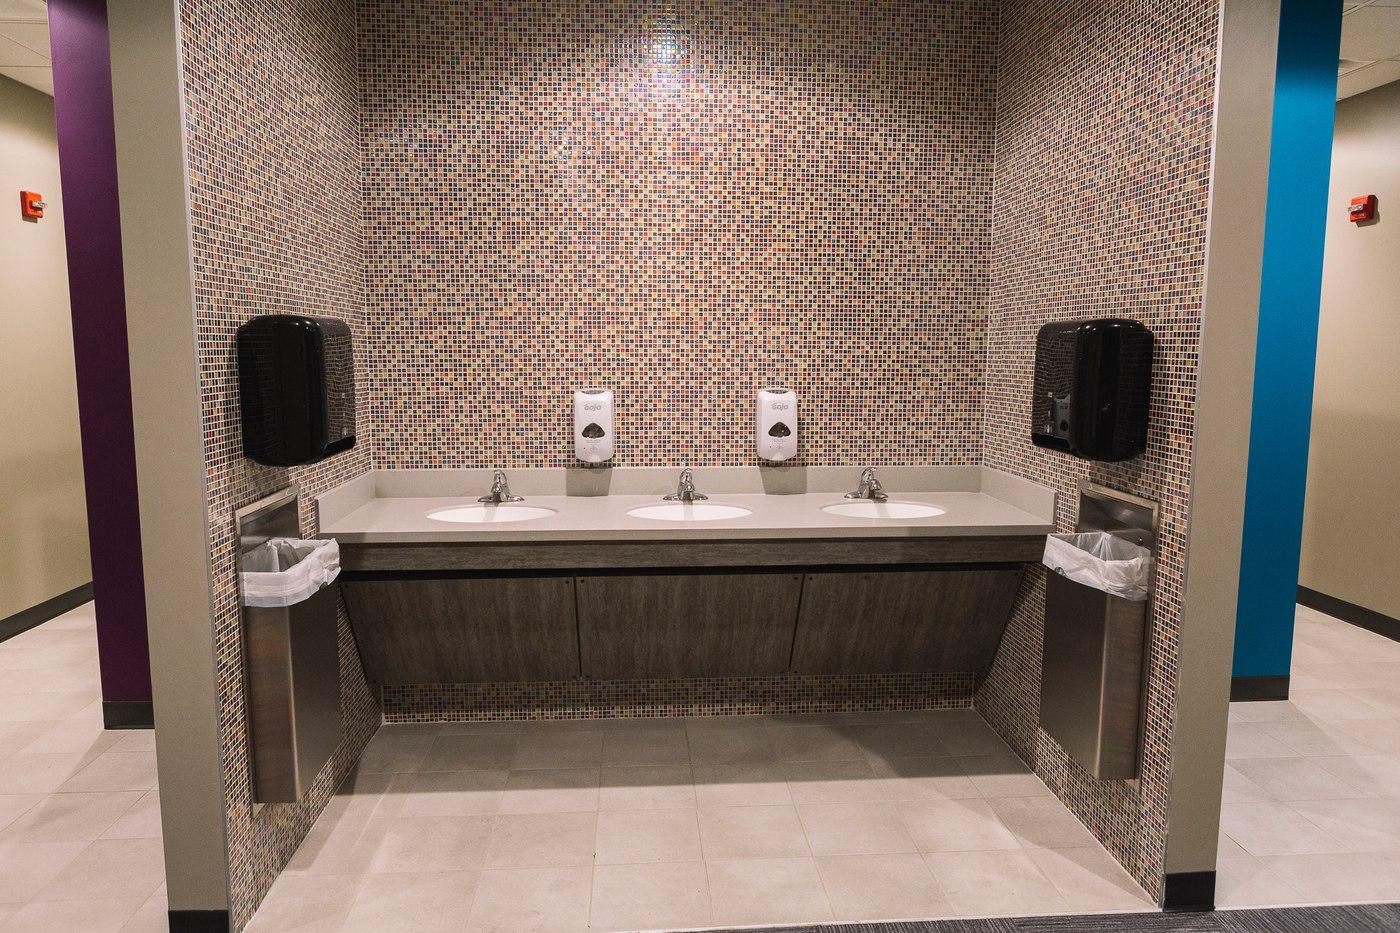 west-bridge-aspen-group-restroom